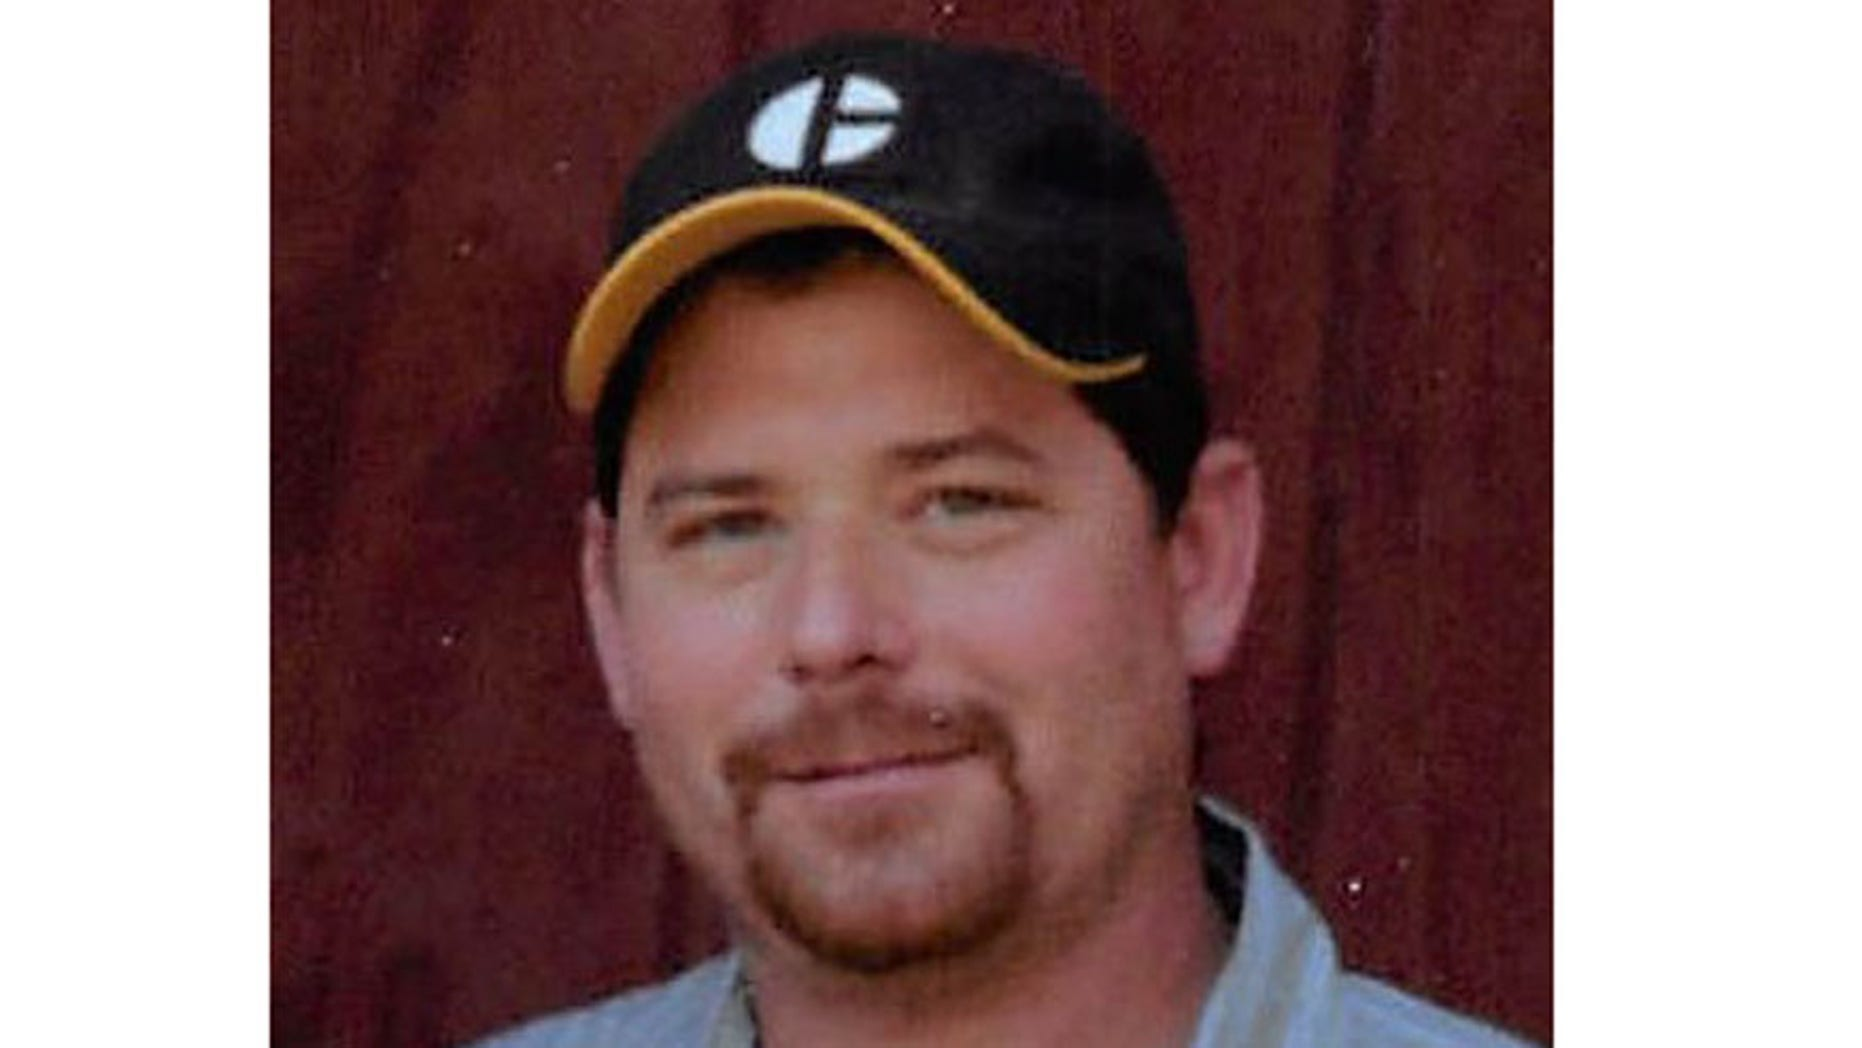 Terrence Brisk, 41, of Belle Prairie Township in Minnesota. (Fox 9)